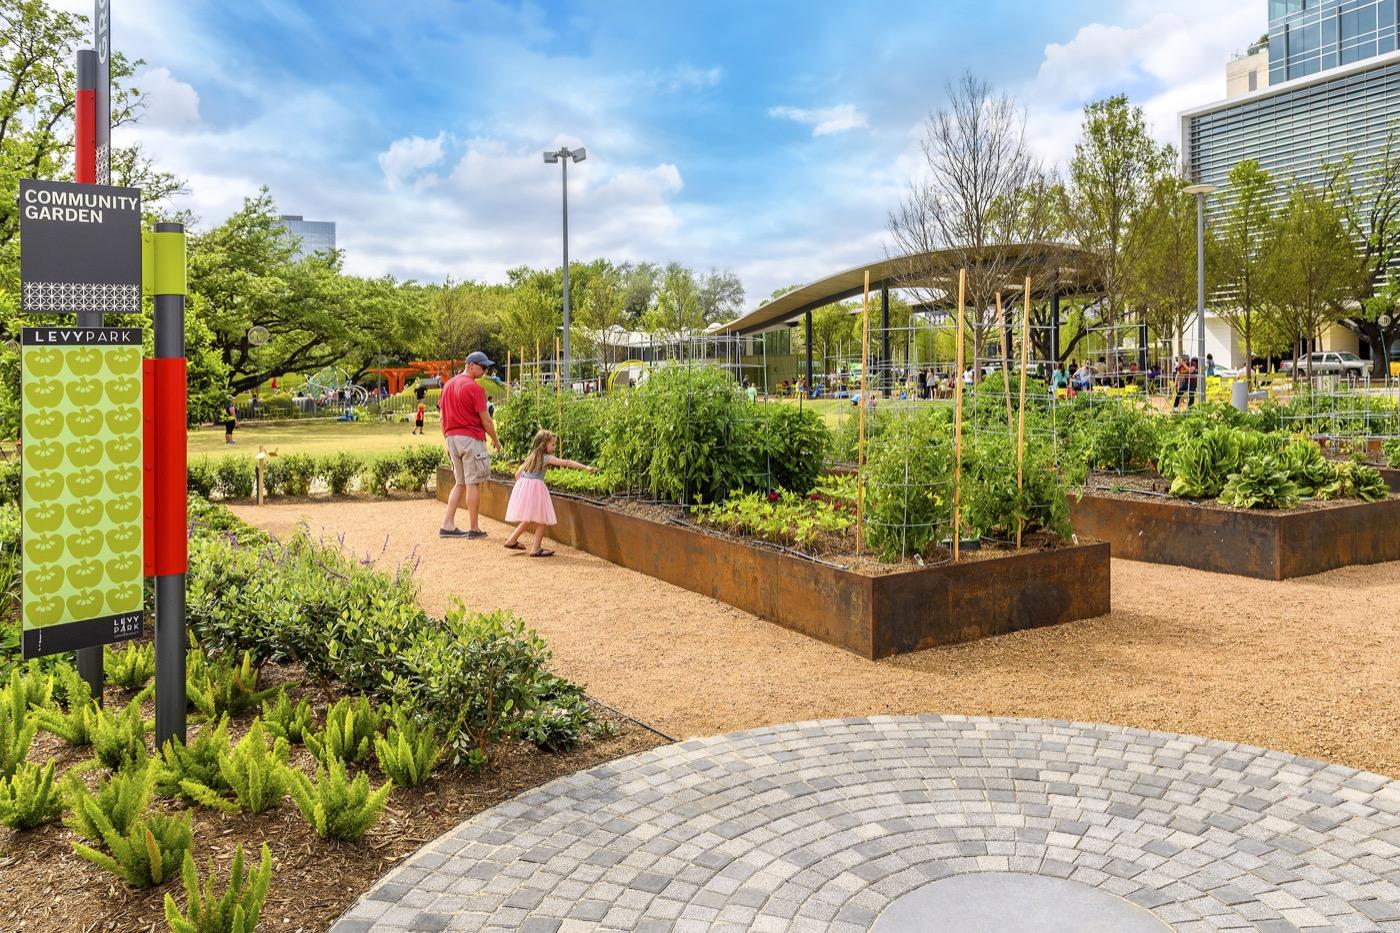 Levy Park Community Garden